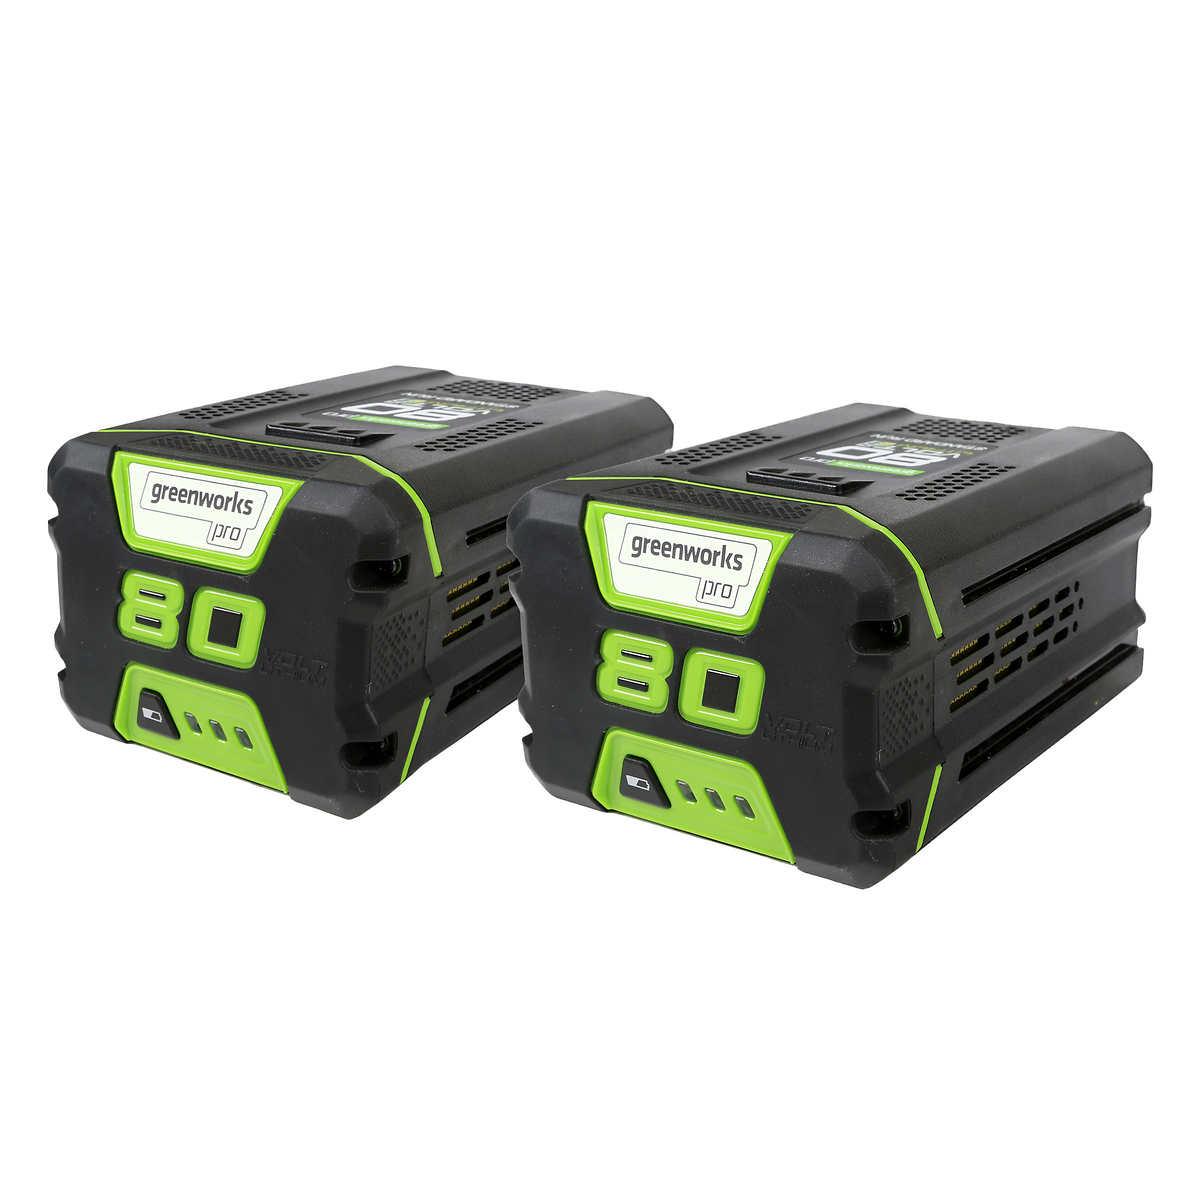 Greenworks 80V 2.0 Ah Lithium Ion Battery, 2-pack $184.99 or 2-pack 4.0 Ah for $289